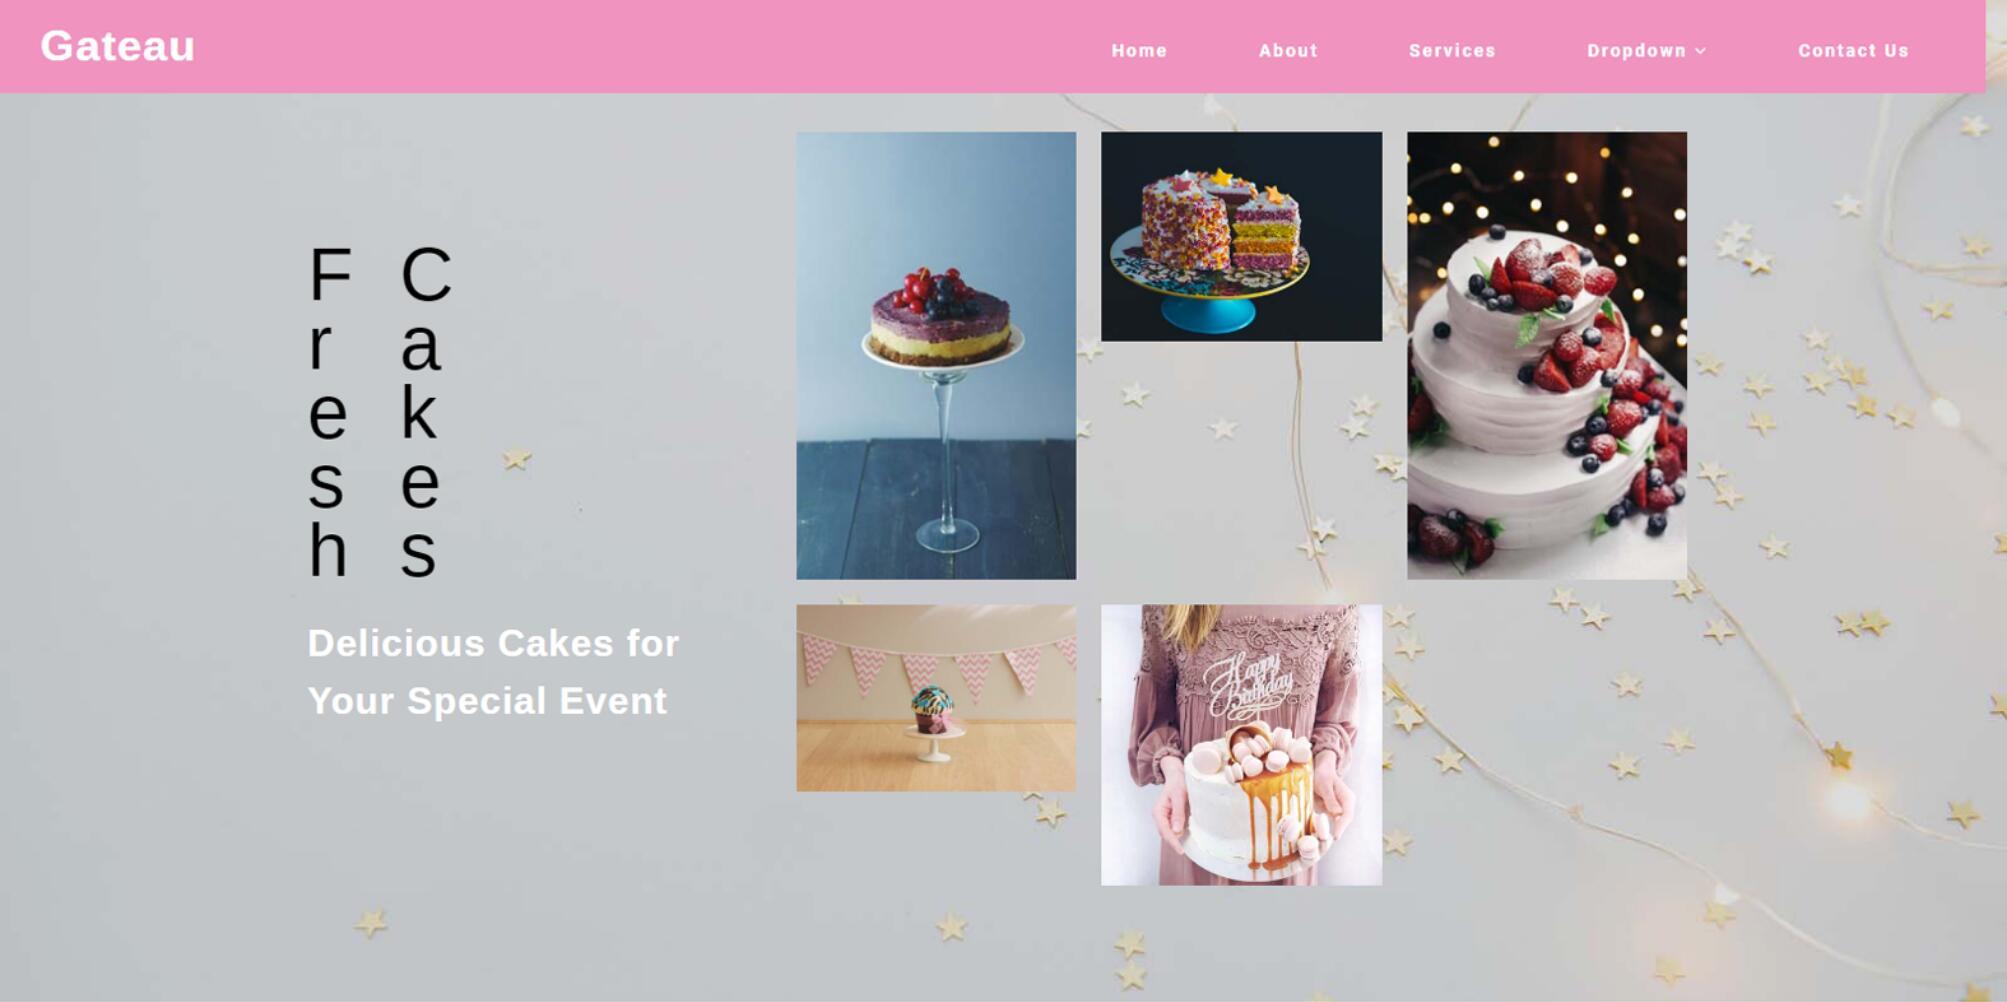 Gateau - Bootstrap Responsive Web Mockup for Restaurant